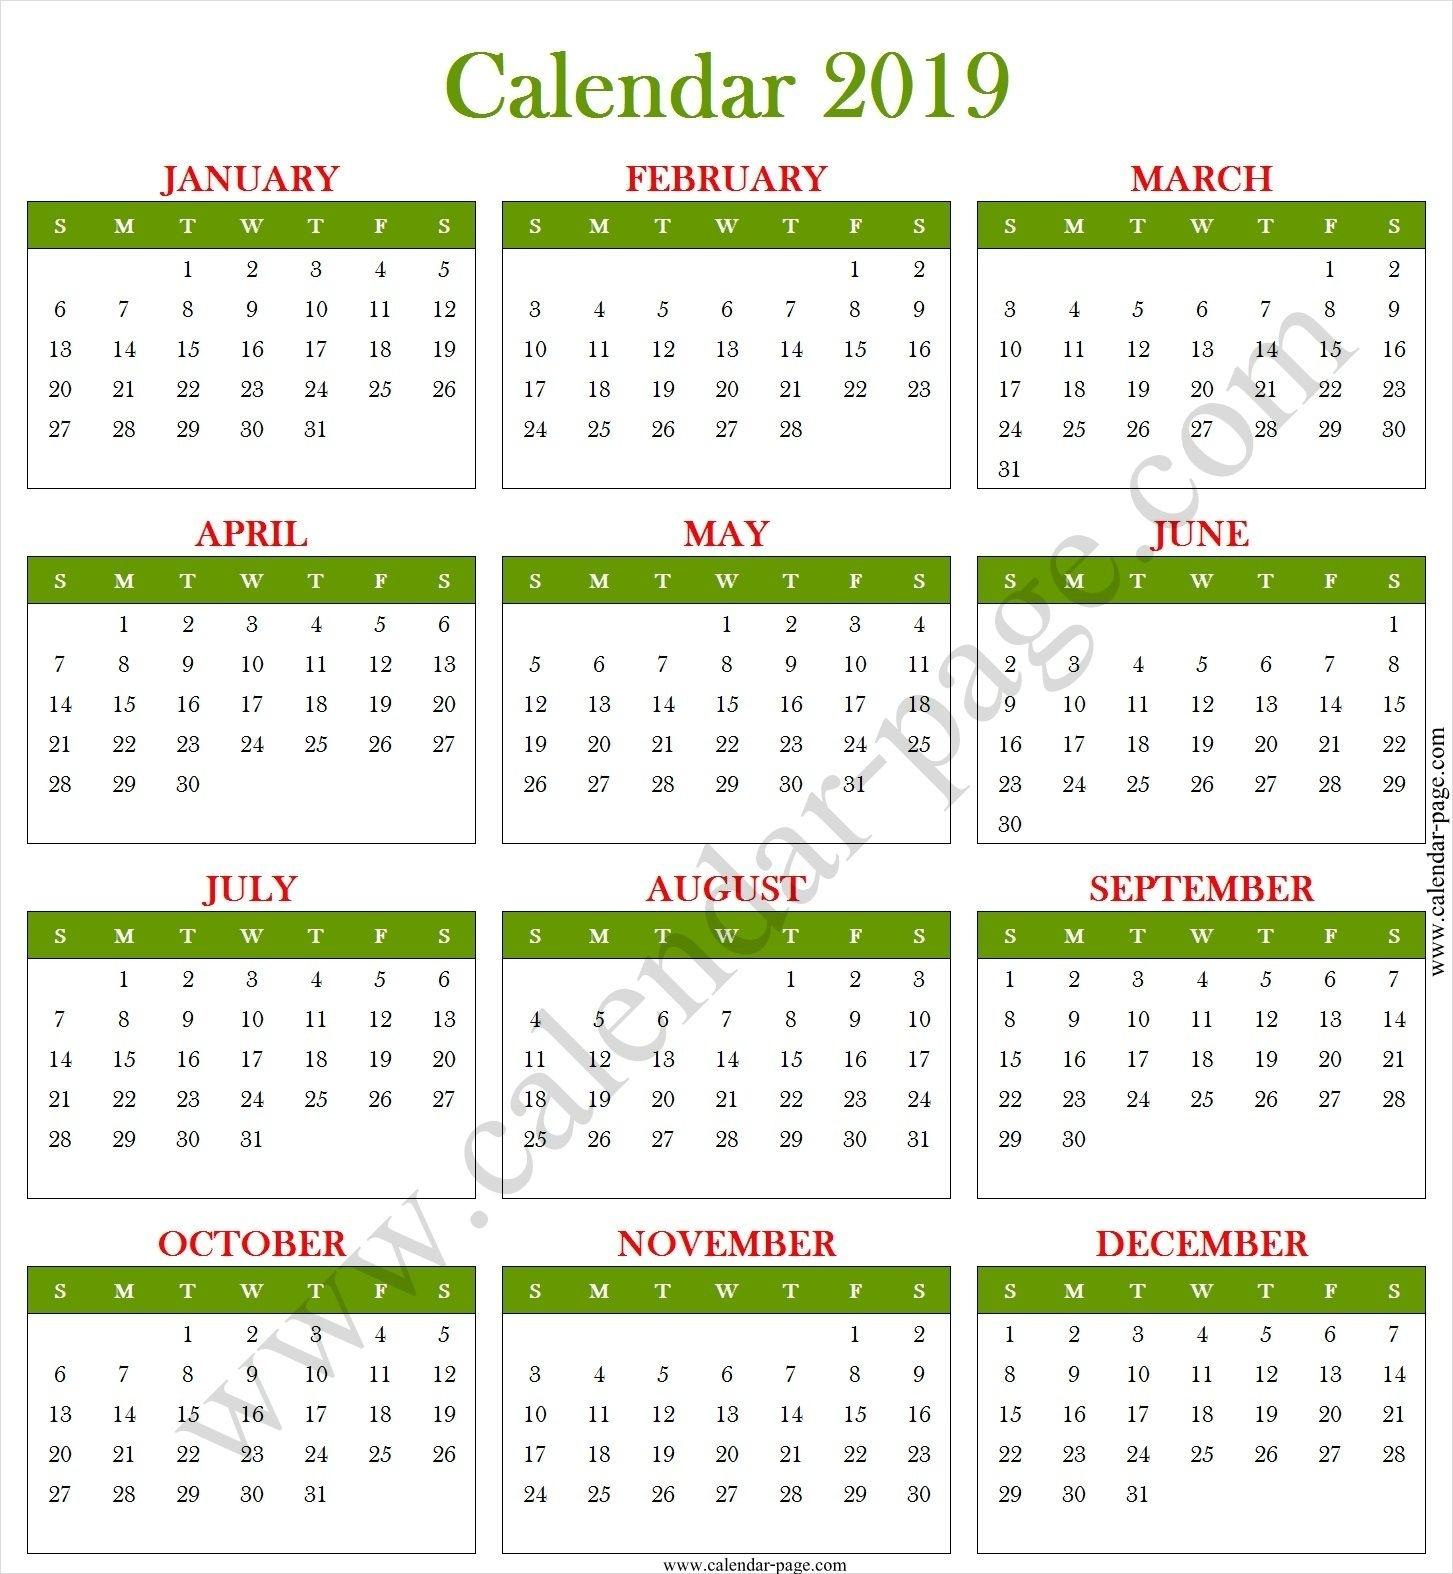 2019 Calendar Bangla | 2019 Calendar, Calendar 2019 Template with 2020 Year Calendar Printable Free Bangla